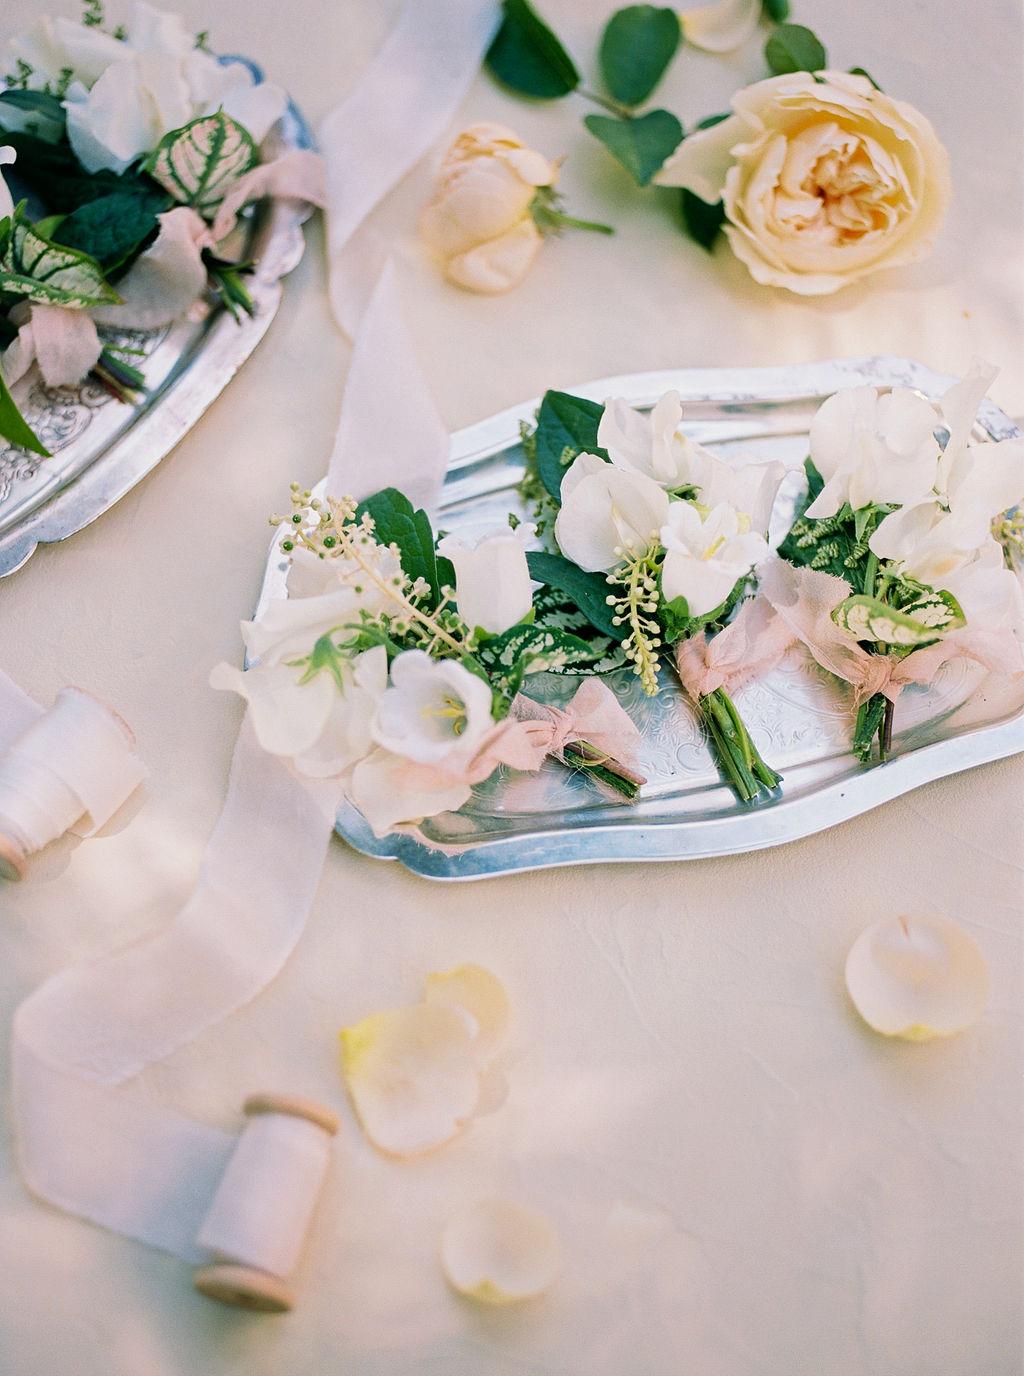 Alexandra-Elise-Photography-Film-Wedding-Photographer-Sonnenberg-Gardens-Finger-Lakes-Canandaigua-Reception-004.jpg